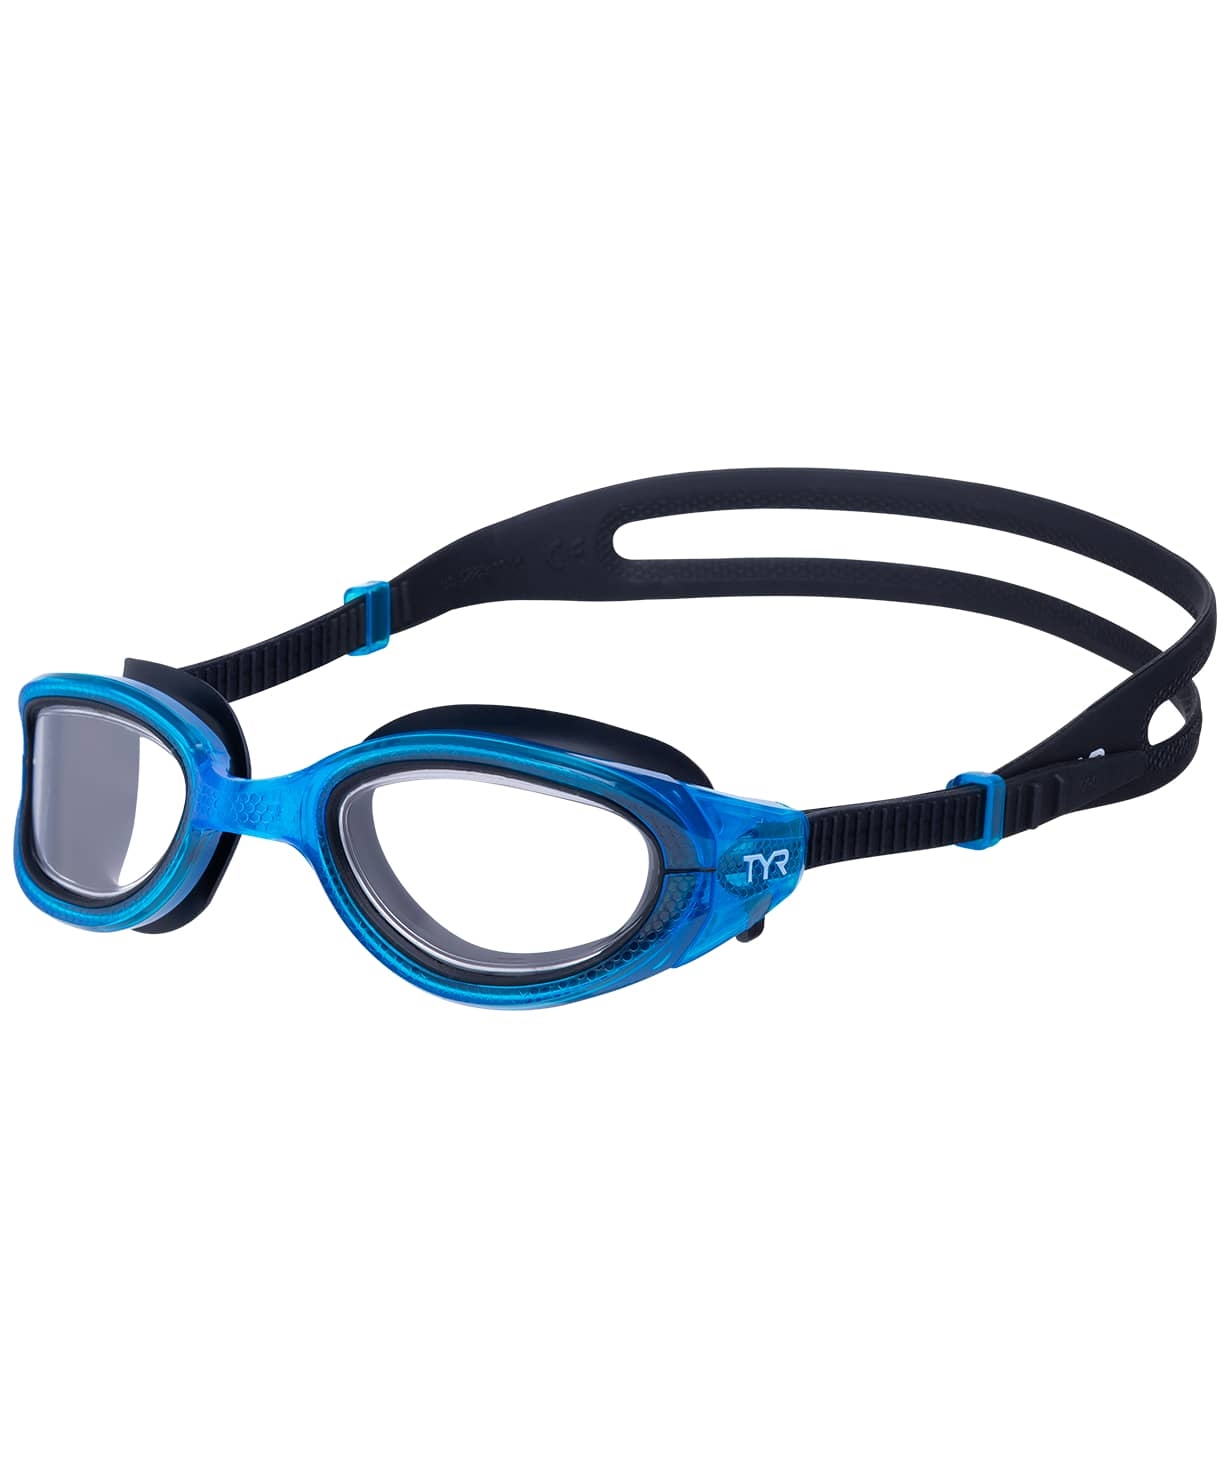 Очки Special Ops 3.0, LGSPL3NM/422,  голубой